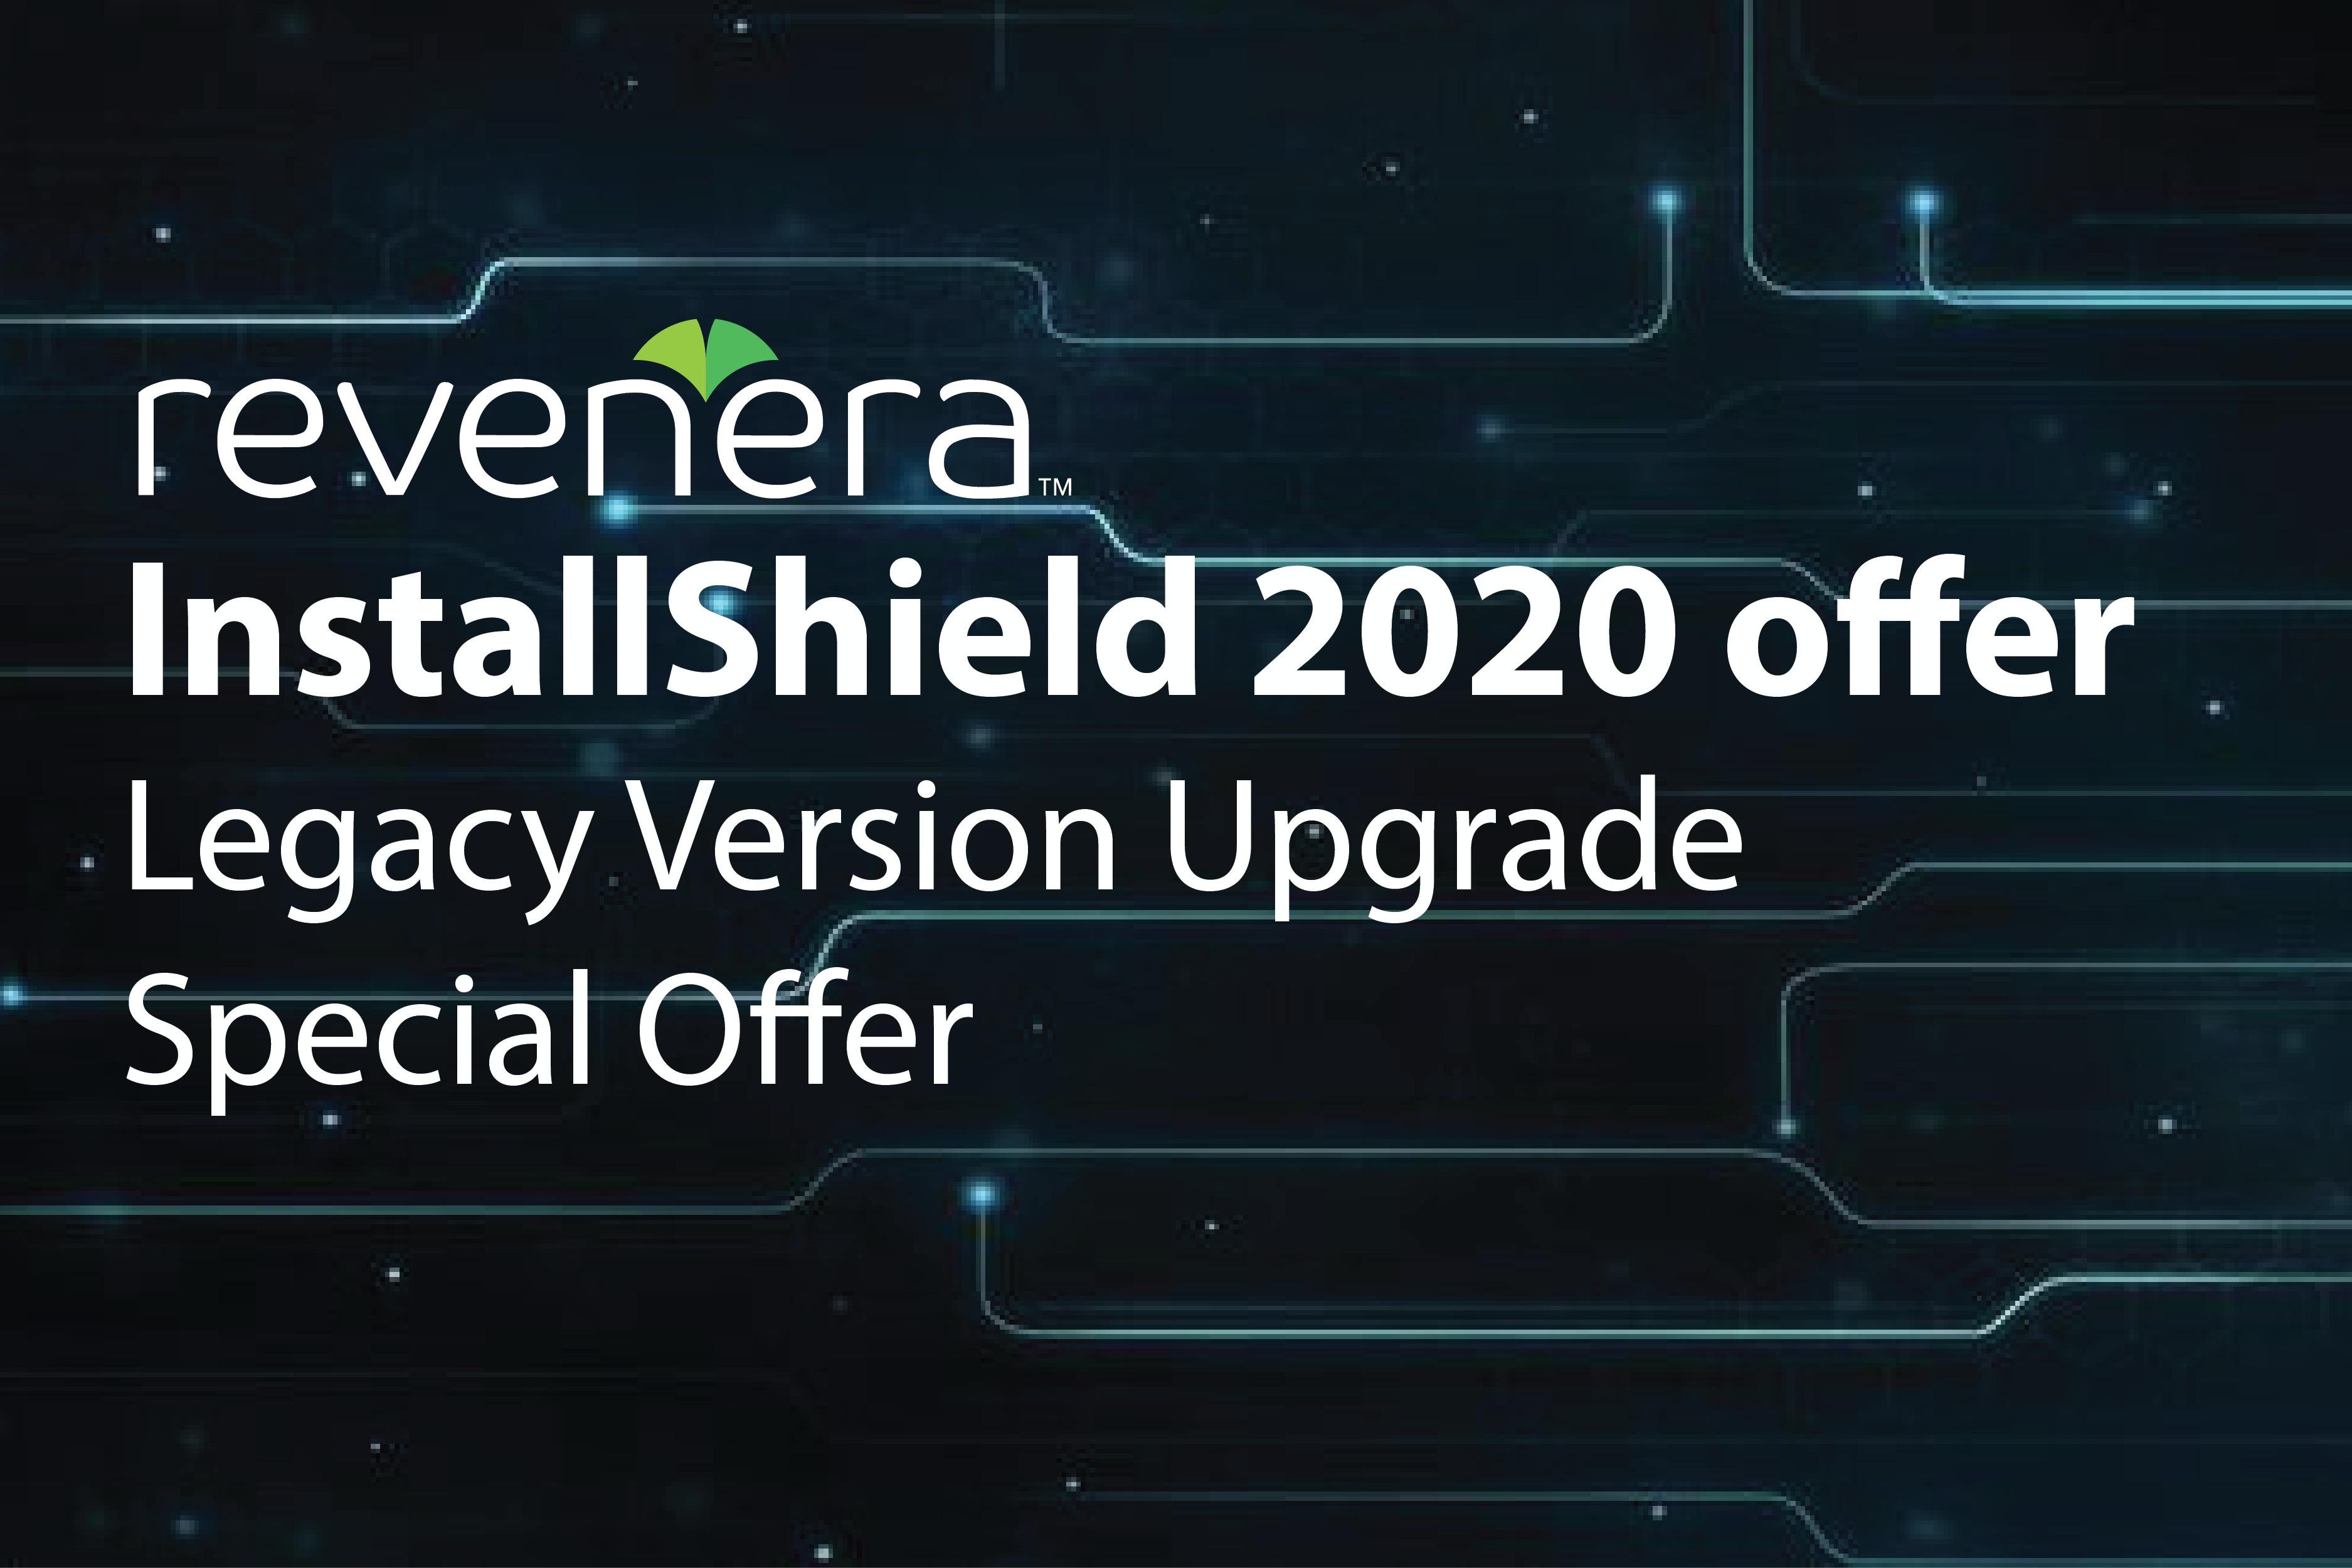 InstallShield 2020 offer | Legacy Version Upgrade Special Offer